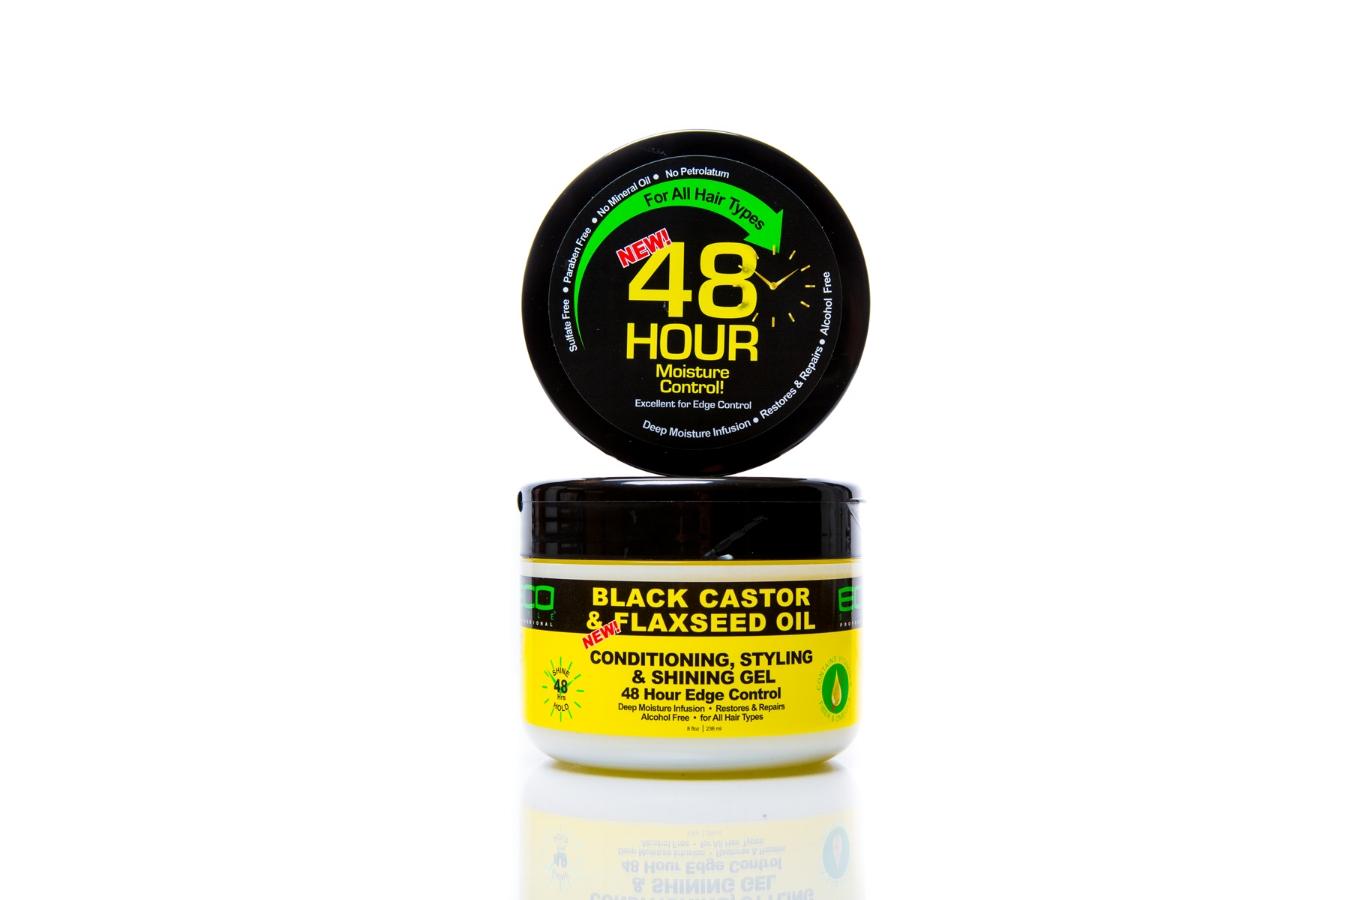 Black Castor & Flaxseed Oil Conditioning, Styling & Shining Gel.jpg